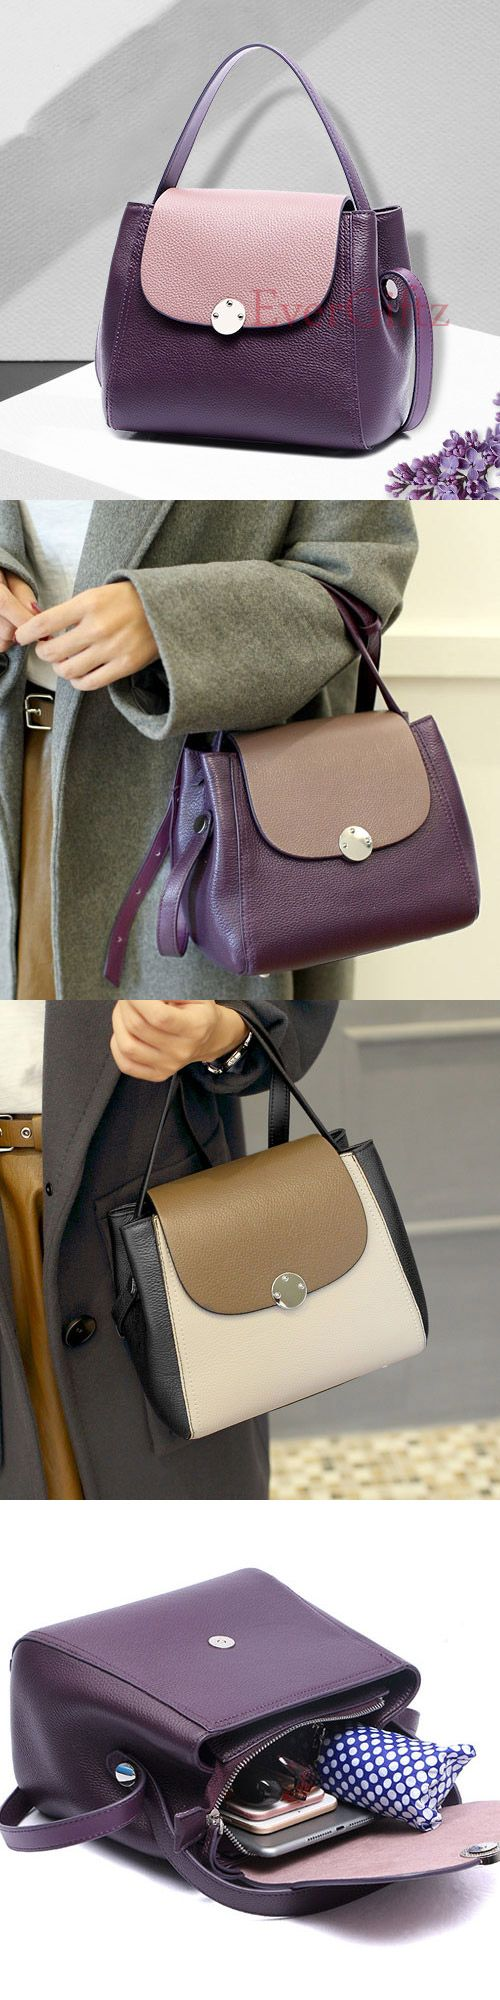 110 Best Bolsos Images On Pinterest Backpacks Fashion Handbags Nucelle Women Leather Purse Satchel Shoulder Bag Handbag Lock Gorgeous Glitter Elegant Blue Genuine Vintage Crossbody